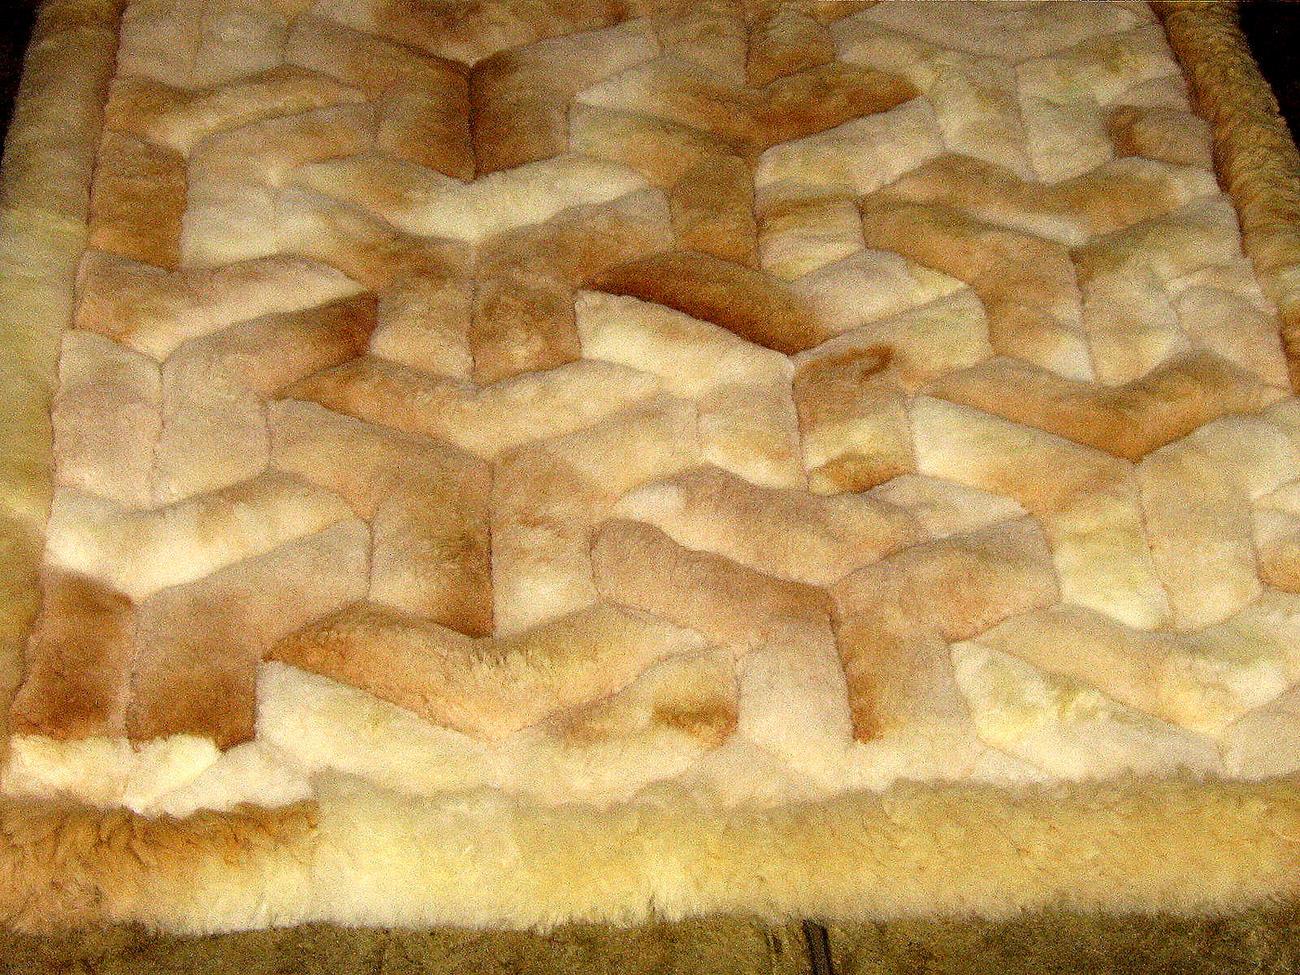 Alpaca fur rug with Y designs, from the Andes of Peru, 80 x 60 cm